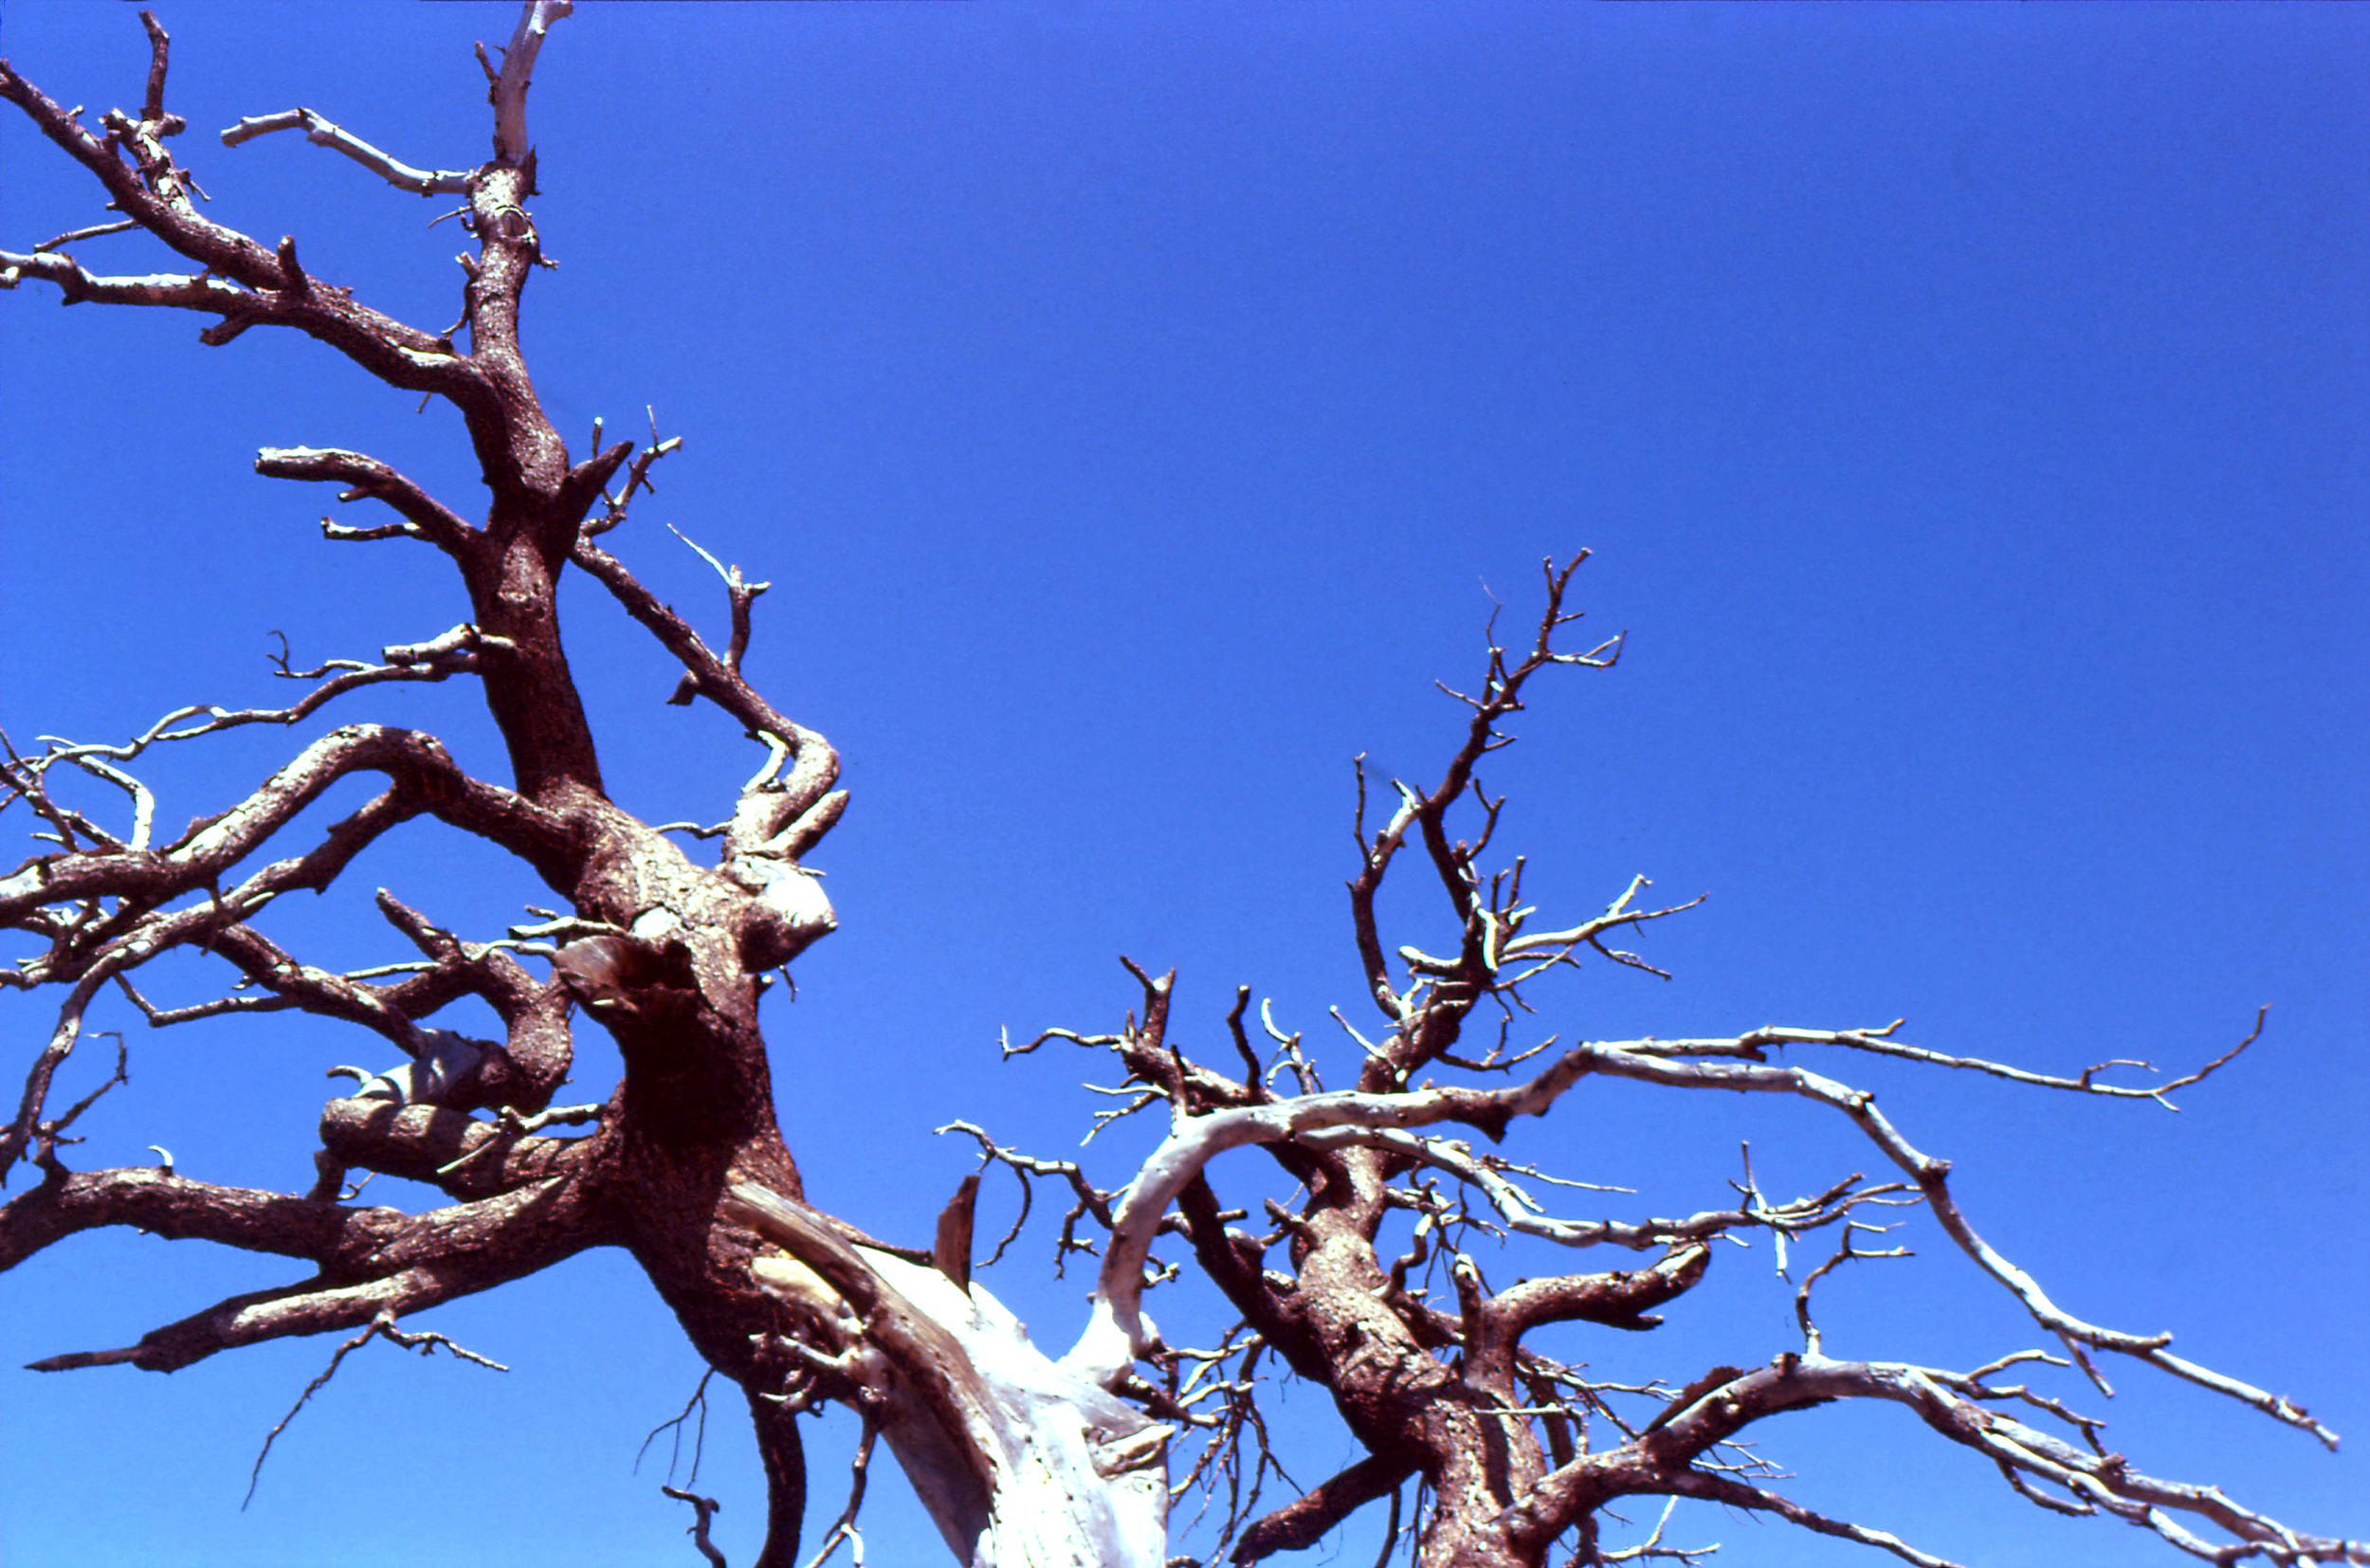 mesaverdetree.jpg